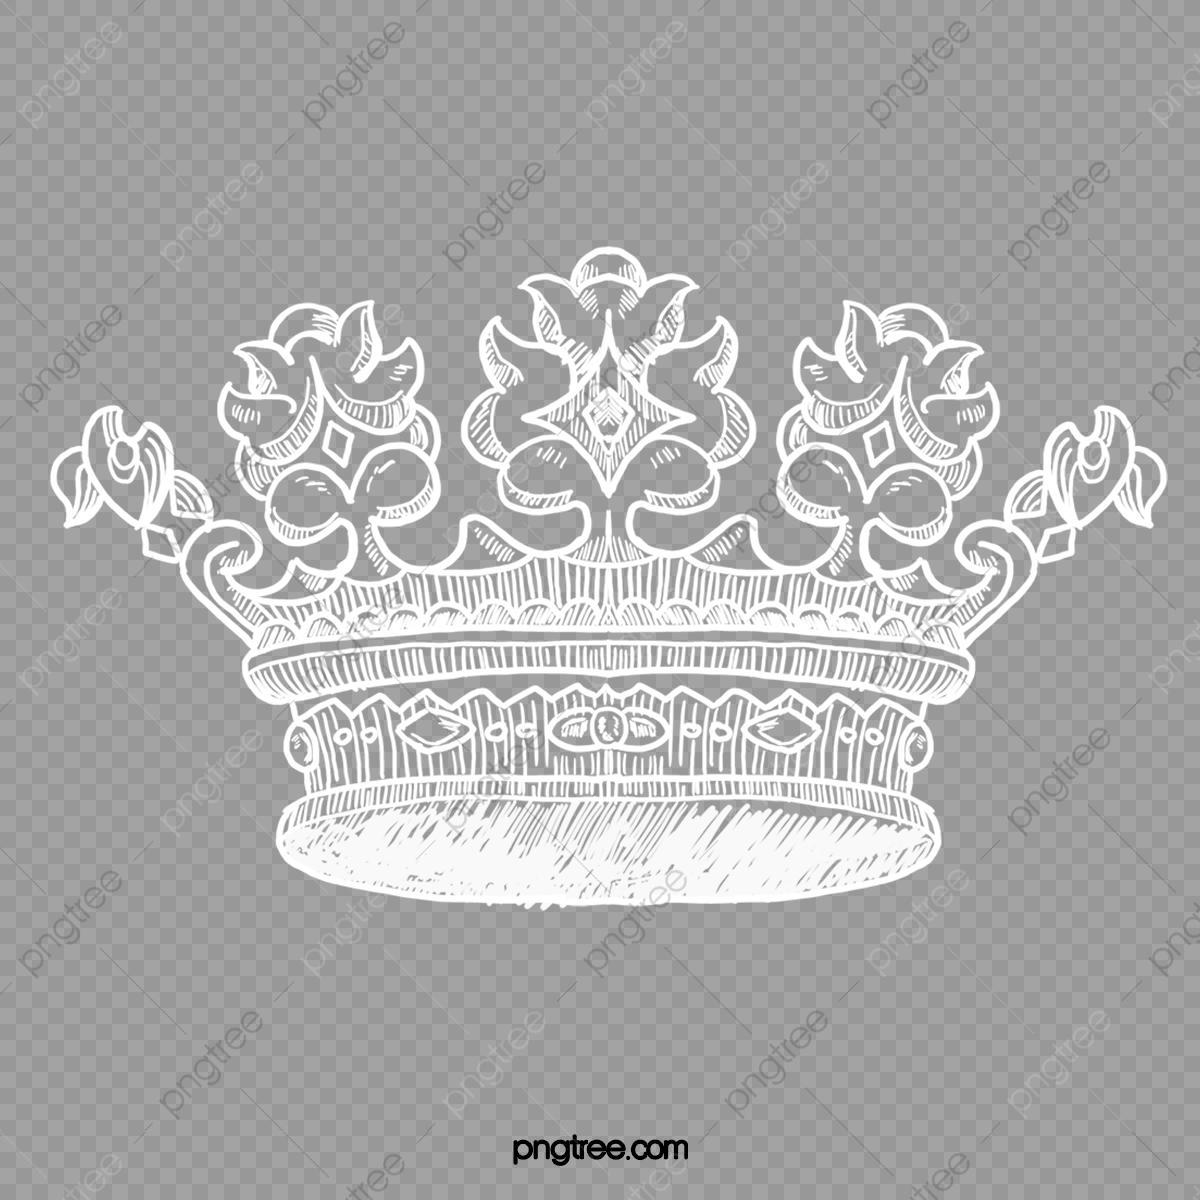 Corona Blanca, Corona Imperial, Hermosa Corona, Material De Corona.